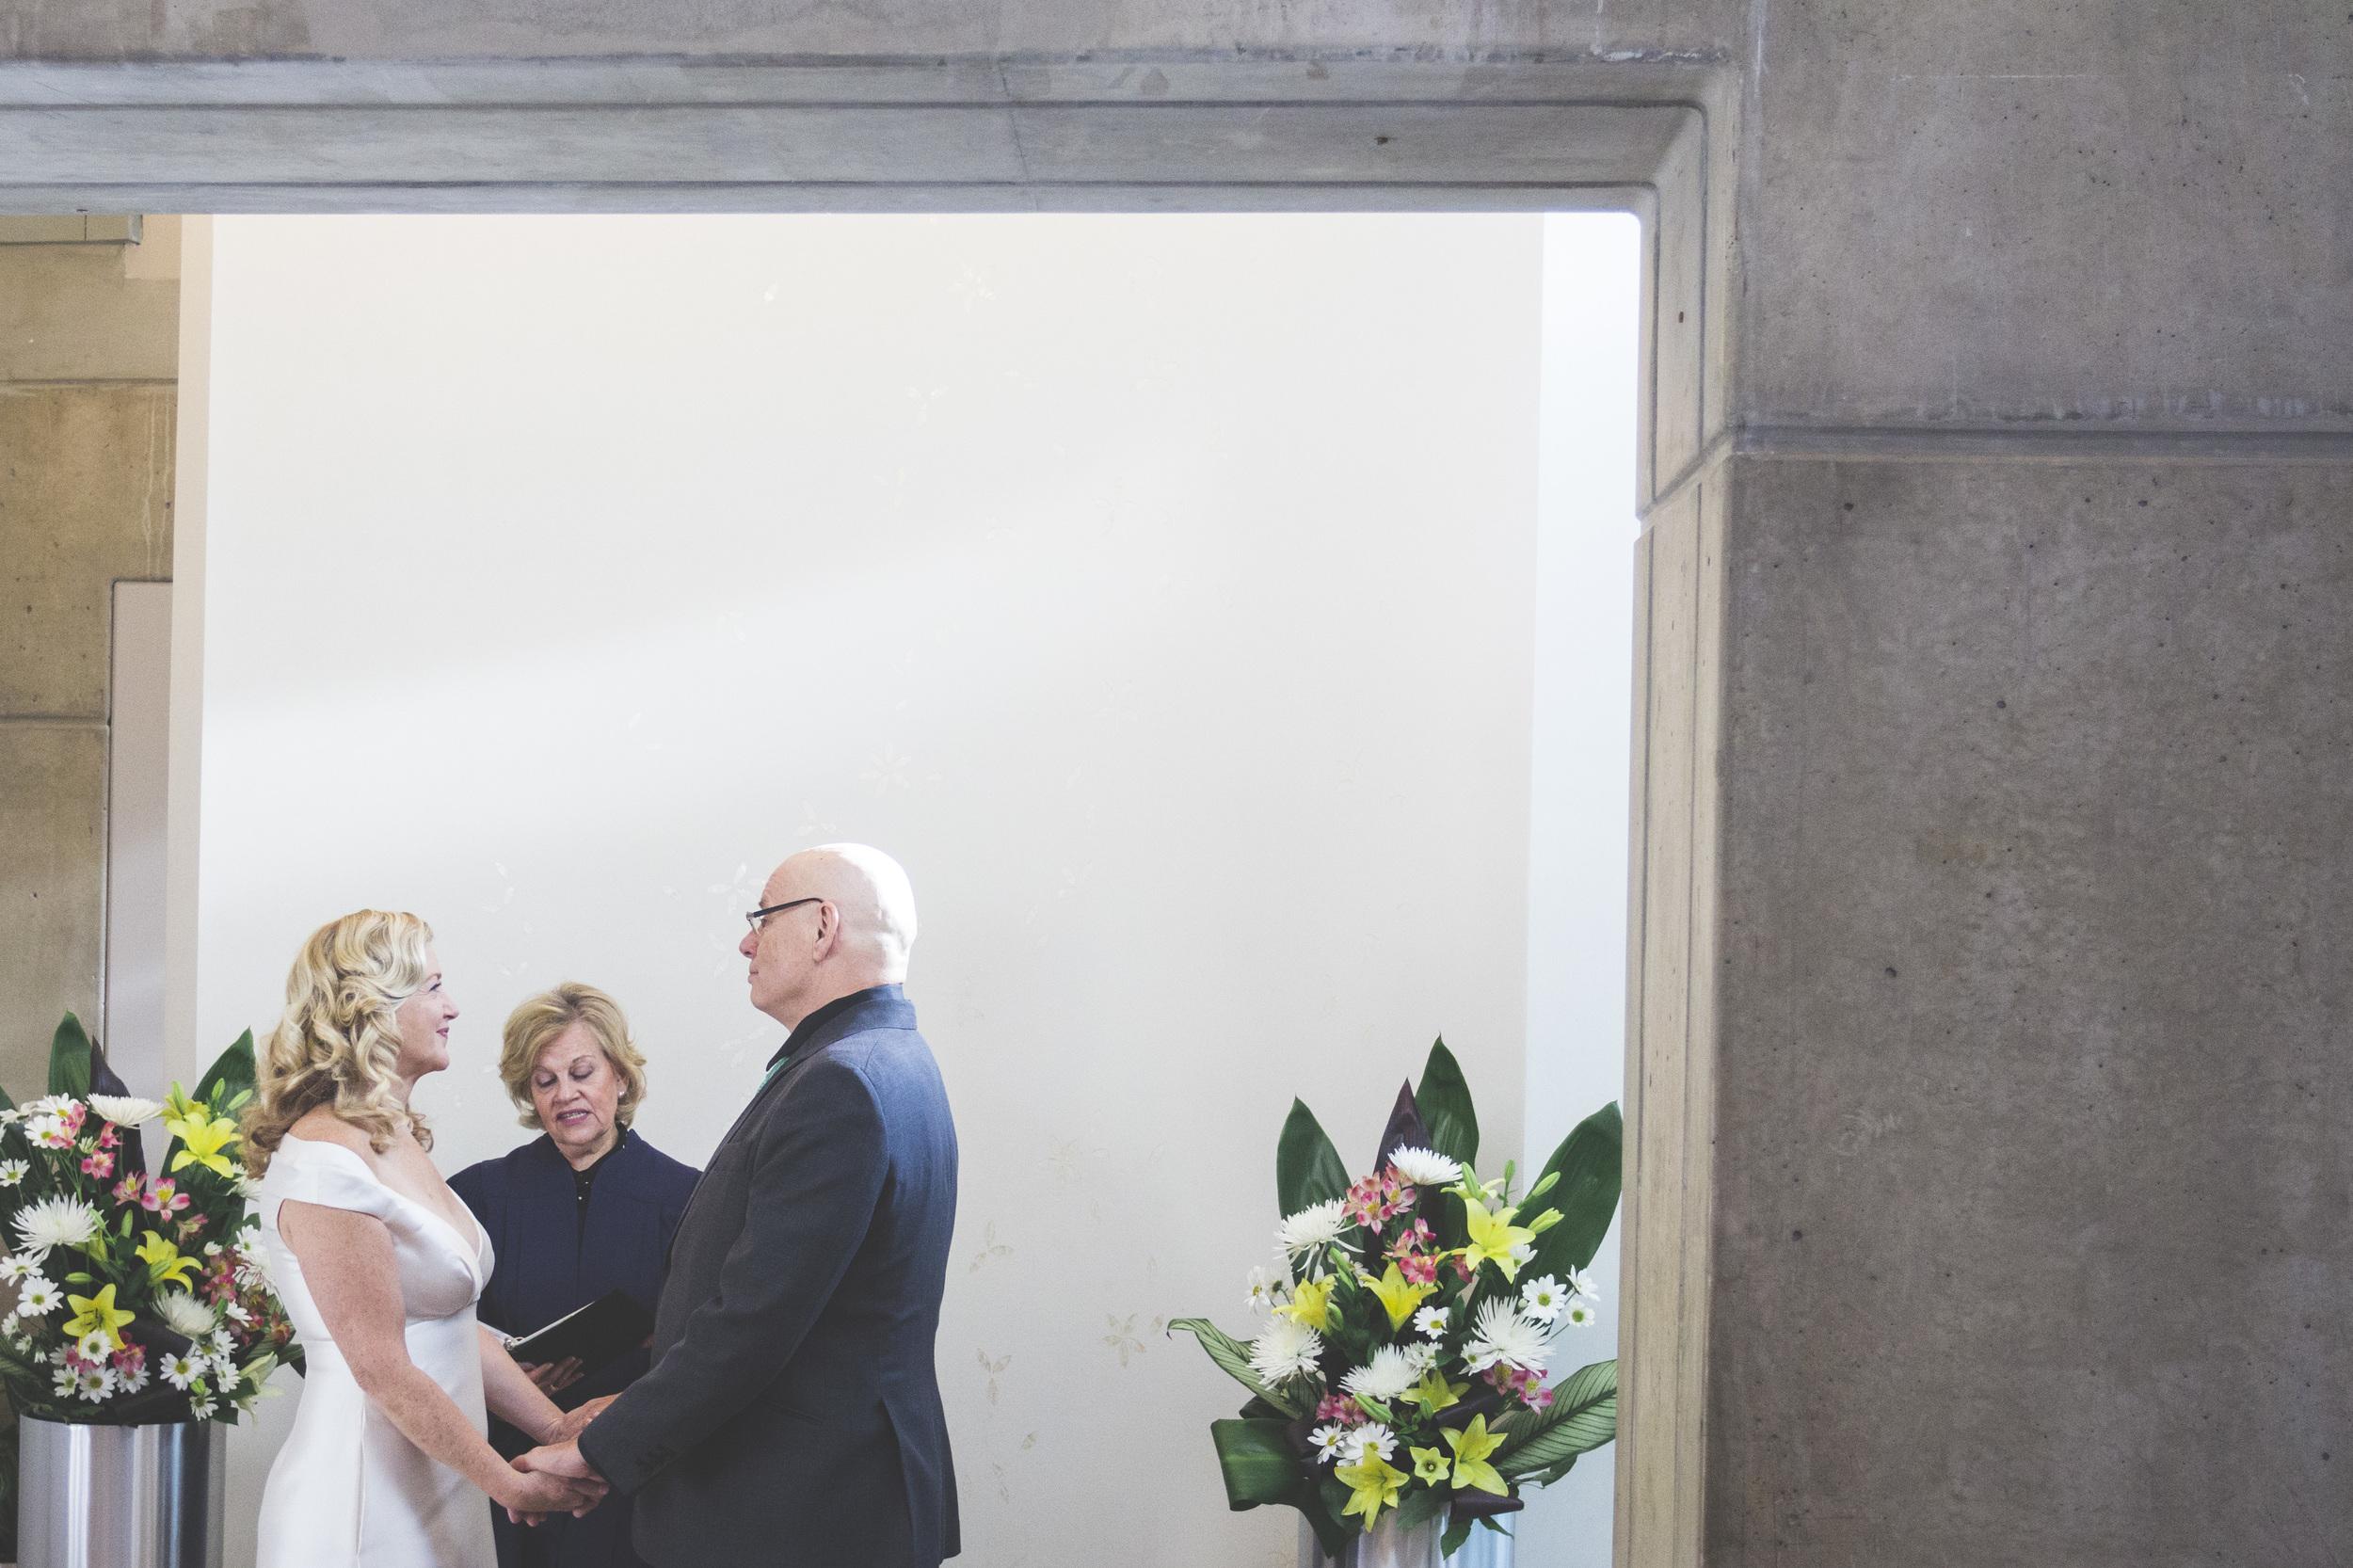 Wedding ceremony at Toronto City Hall.